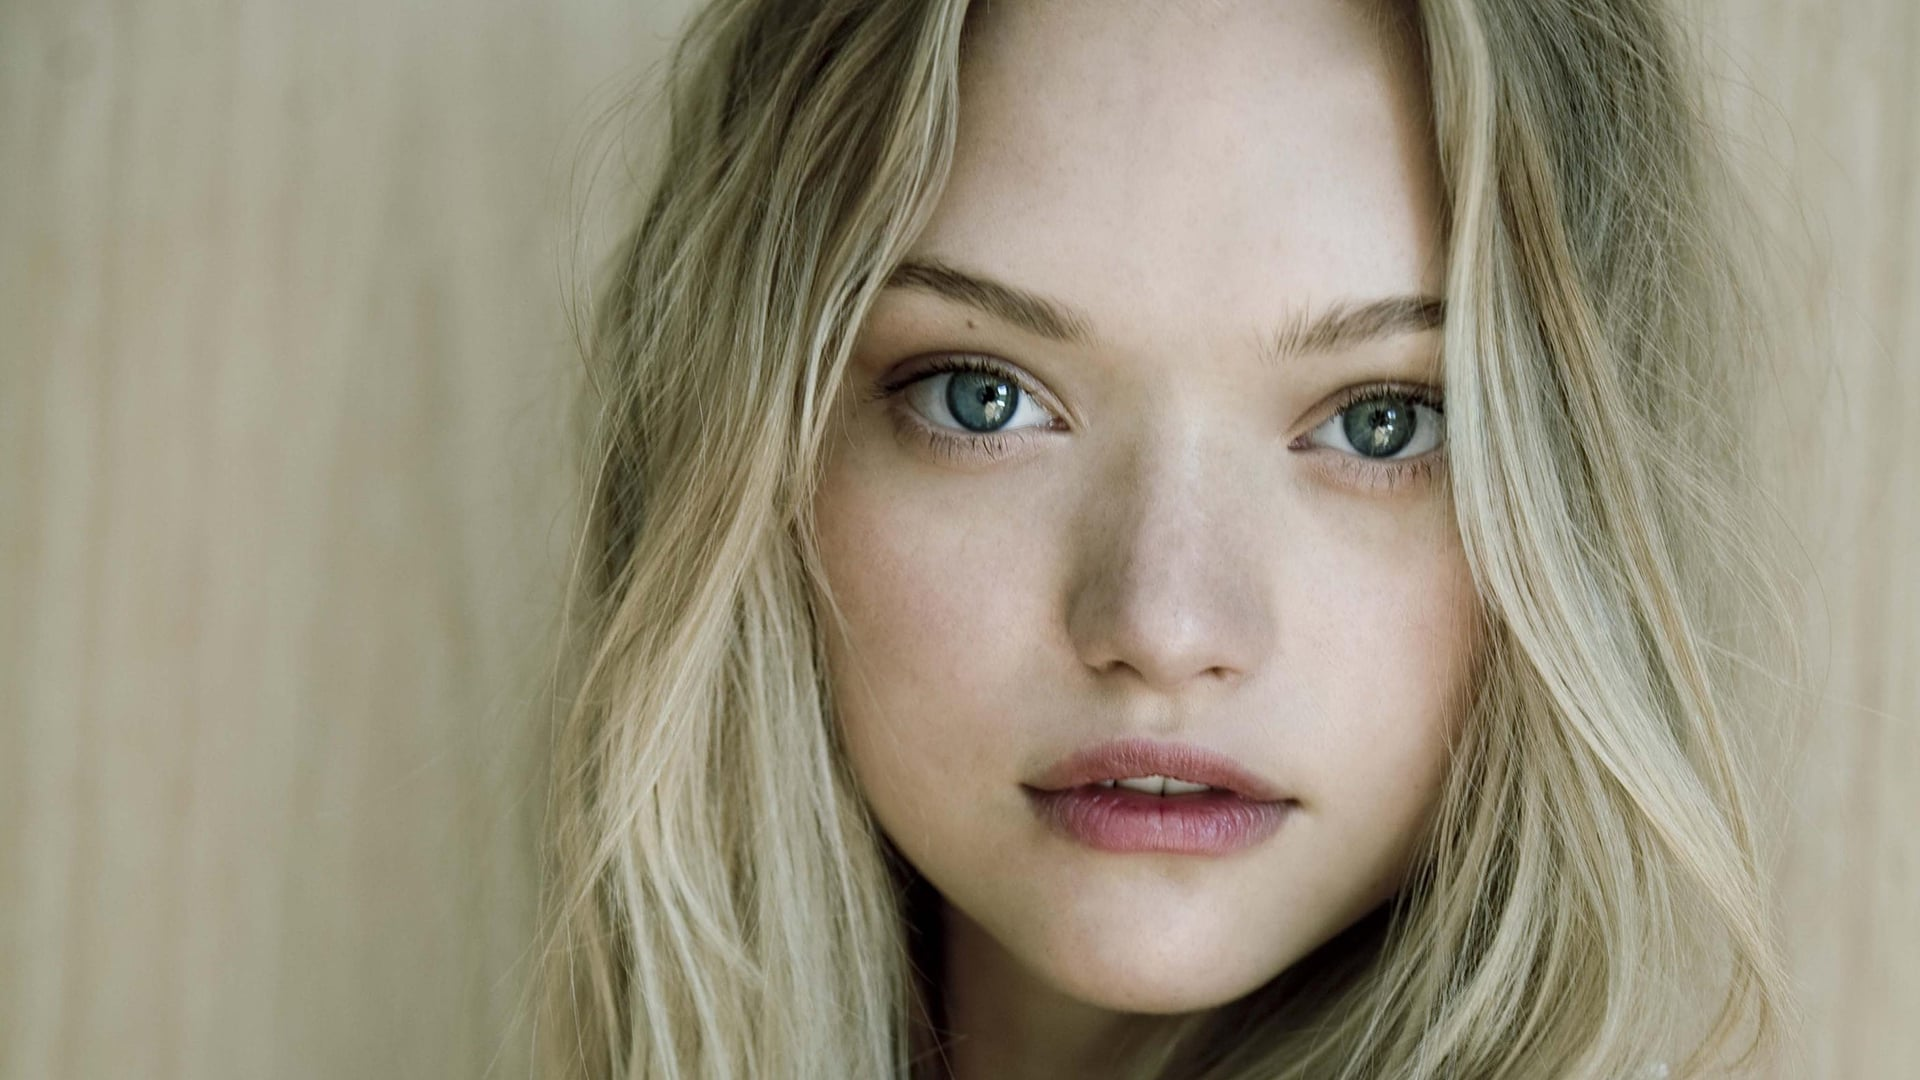 Australian Blonde Blue Eyes Face Gemma Ward Model Wallpaper -  Resolution:1920x1080 - ID:871789 - wallha.com